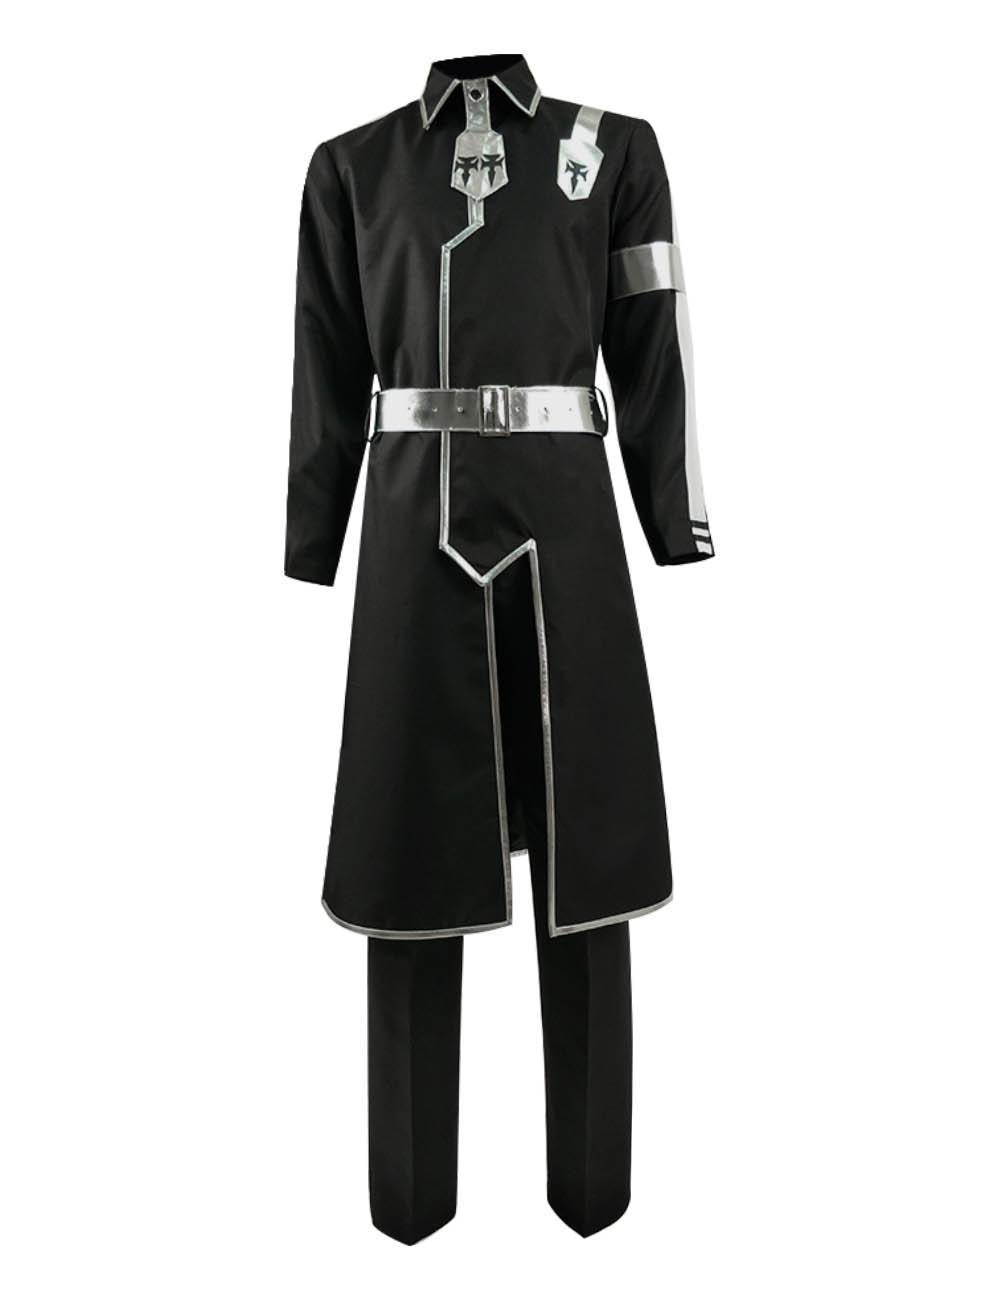 Cosdaddy Alicization SAO Kirito Cosplay Costume Black Battle Suit Game Costume Kirigaya Kazuto Anime Cosplay for Men Adult